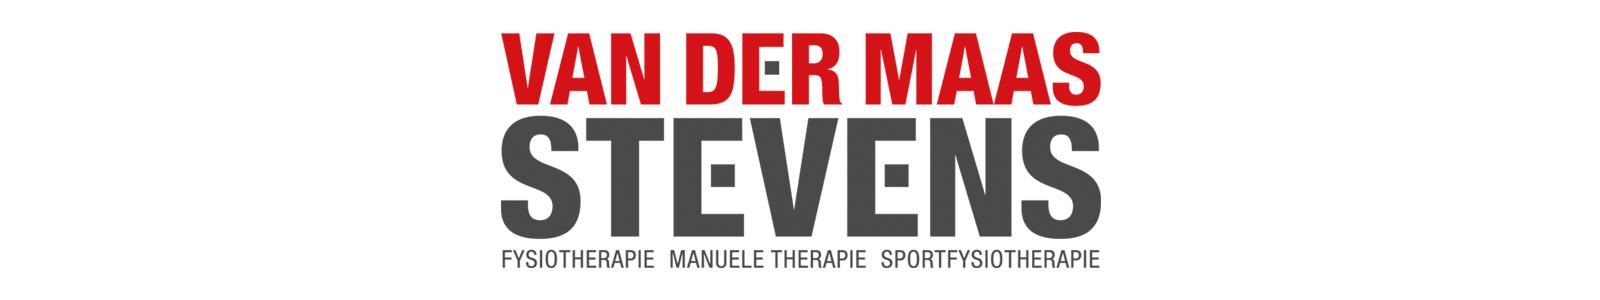 Fysiotherapie praktijk Breda Ginneken Centrum Ralf van der Maas Jef Stevens